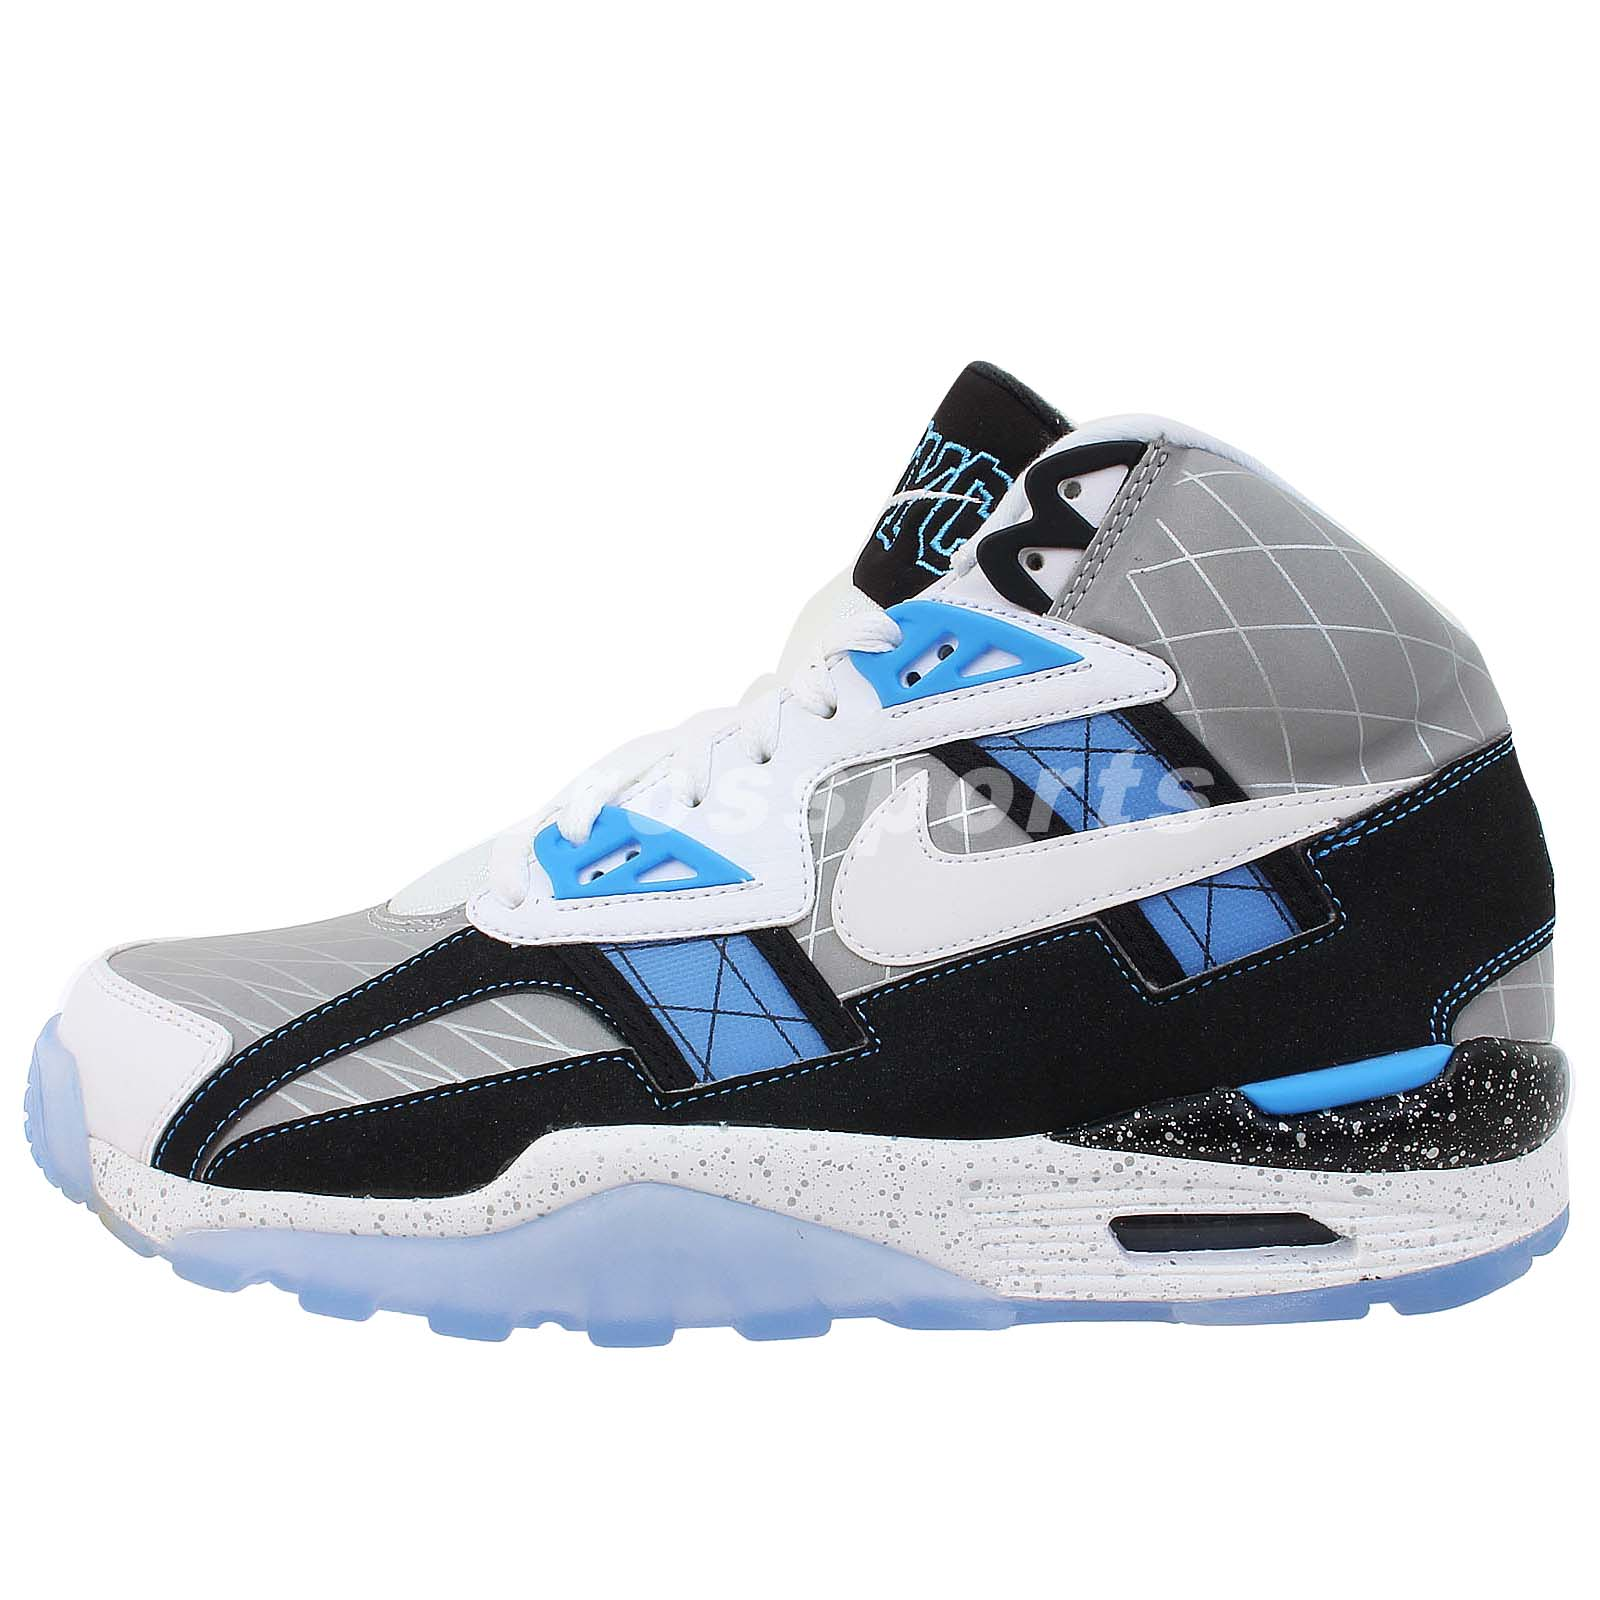 New Bo Jackson Shoes